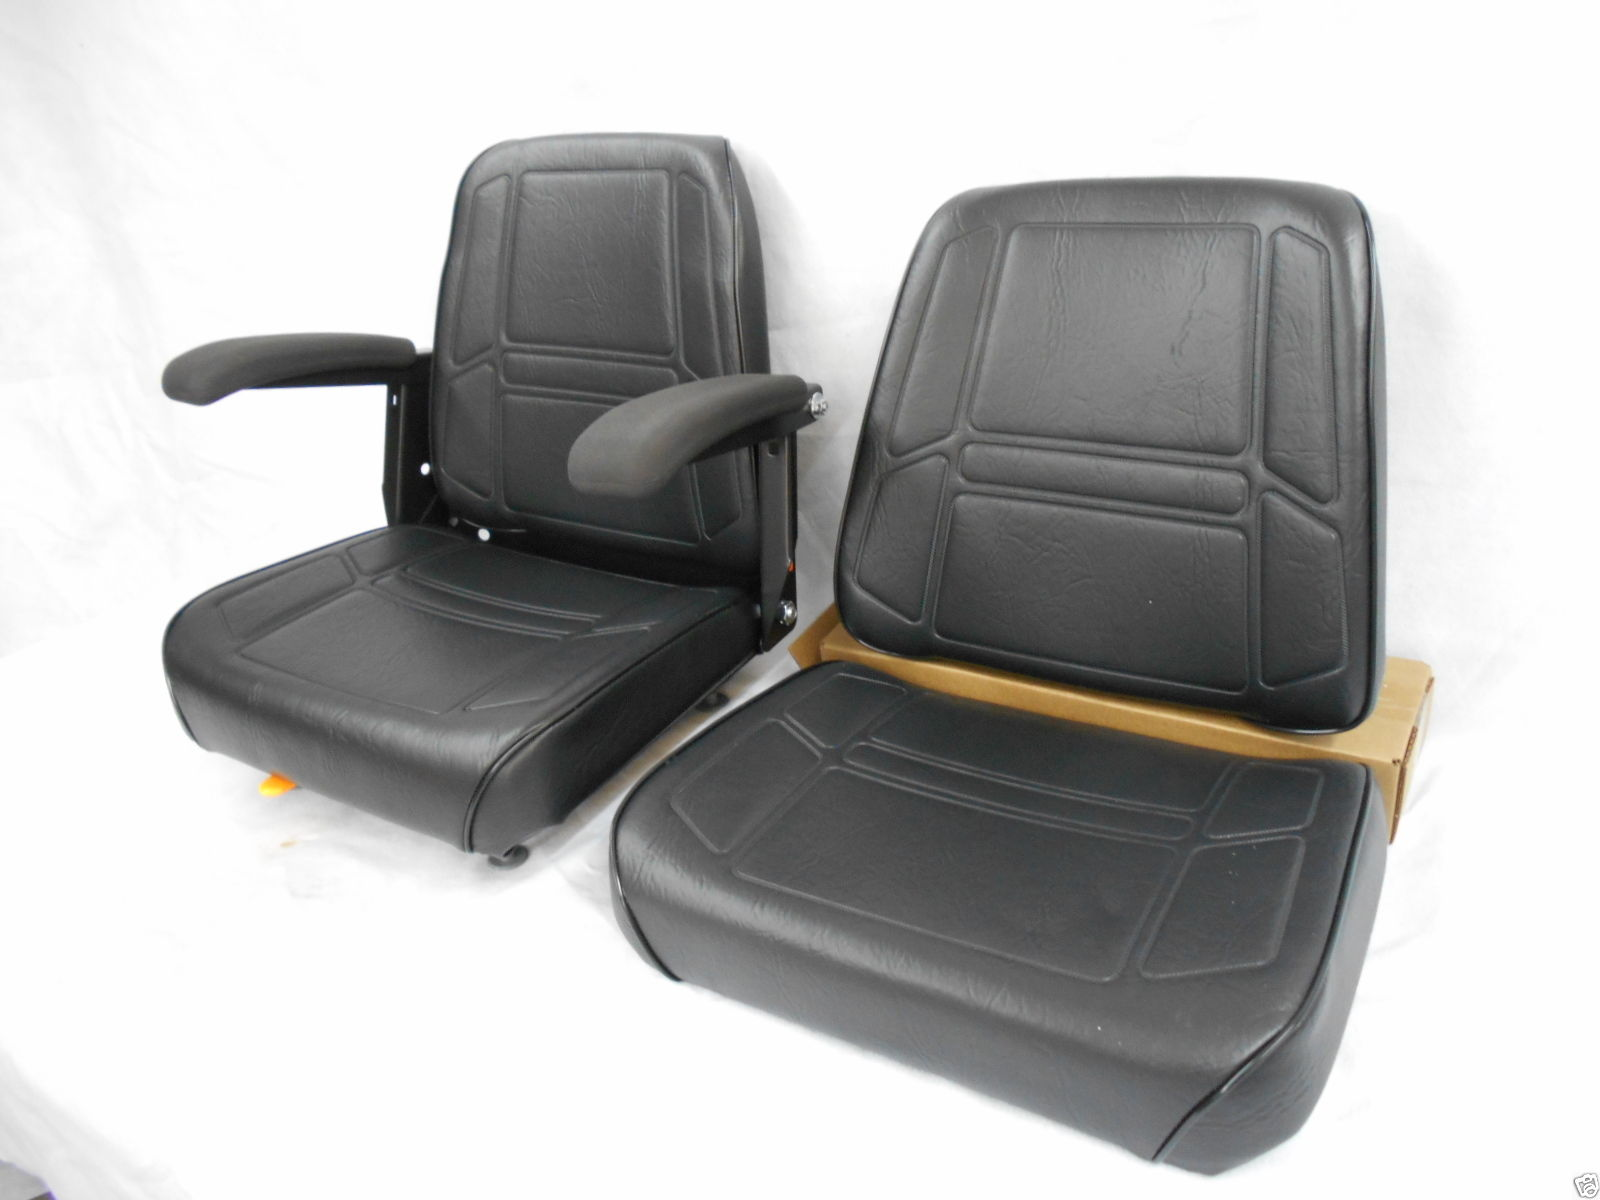 KUBOTA SEAT REPLACEMENT CUSHION SET ZD21 ZD25 ZD28 ZG20 ZG23 – Kubota Zd25 Wiring Diagram